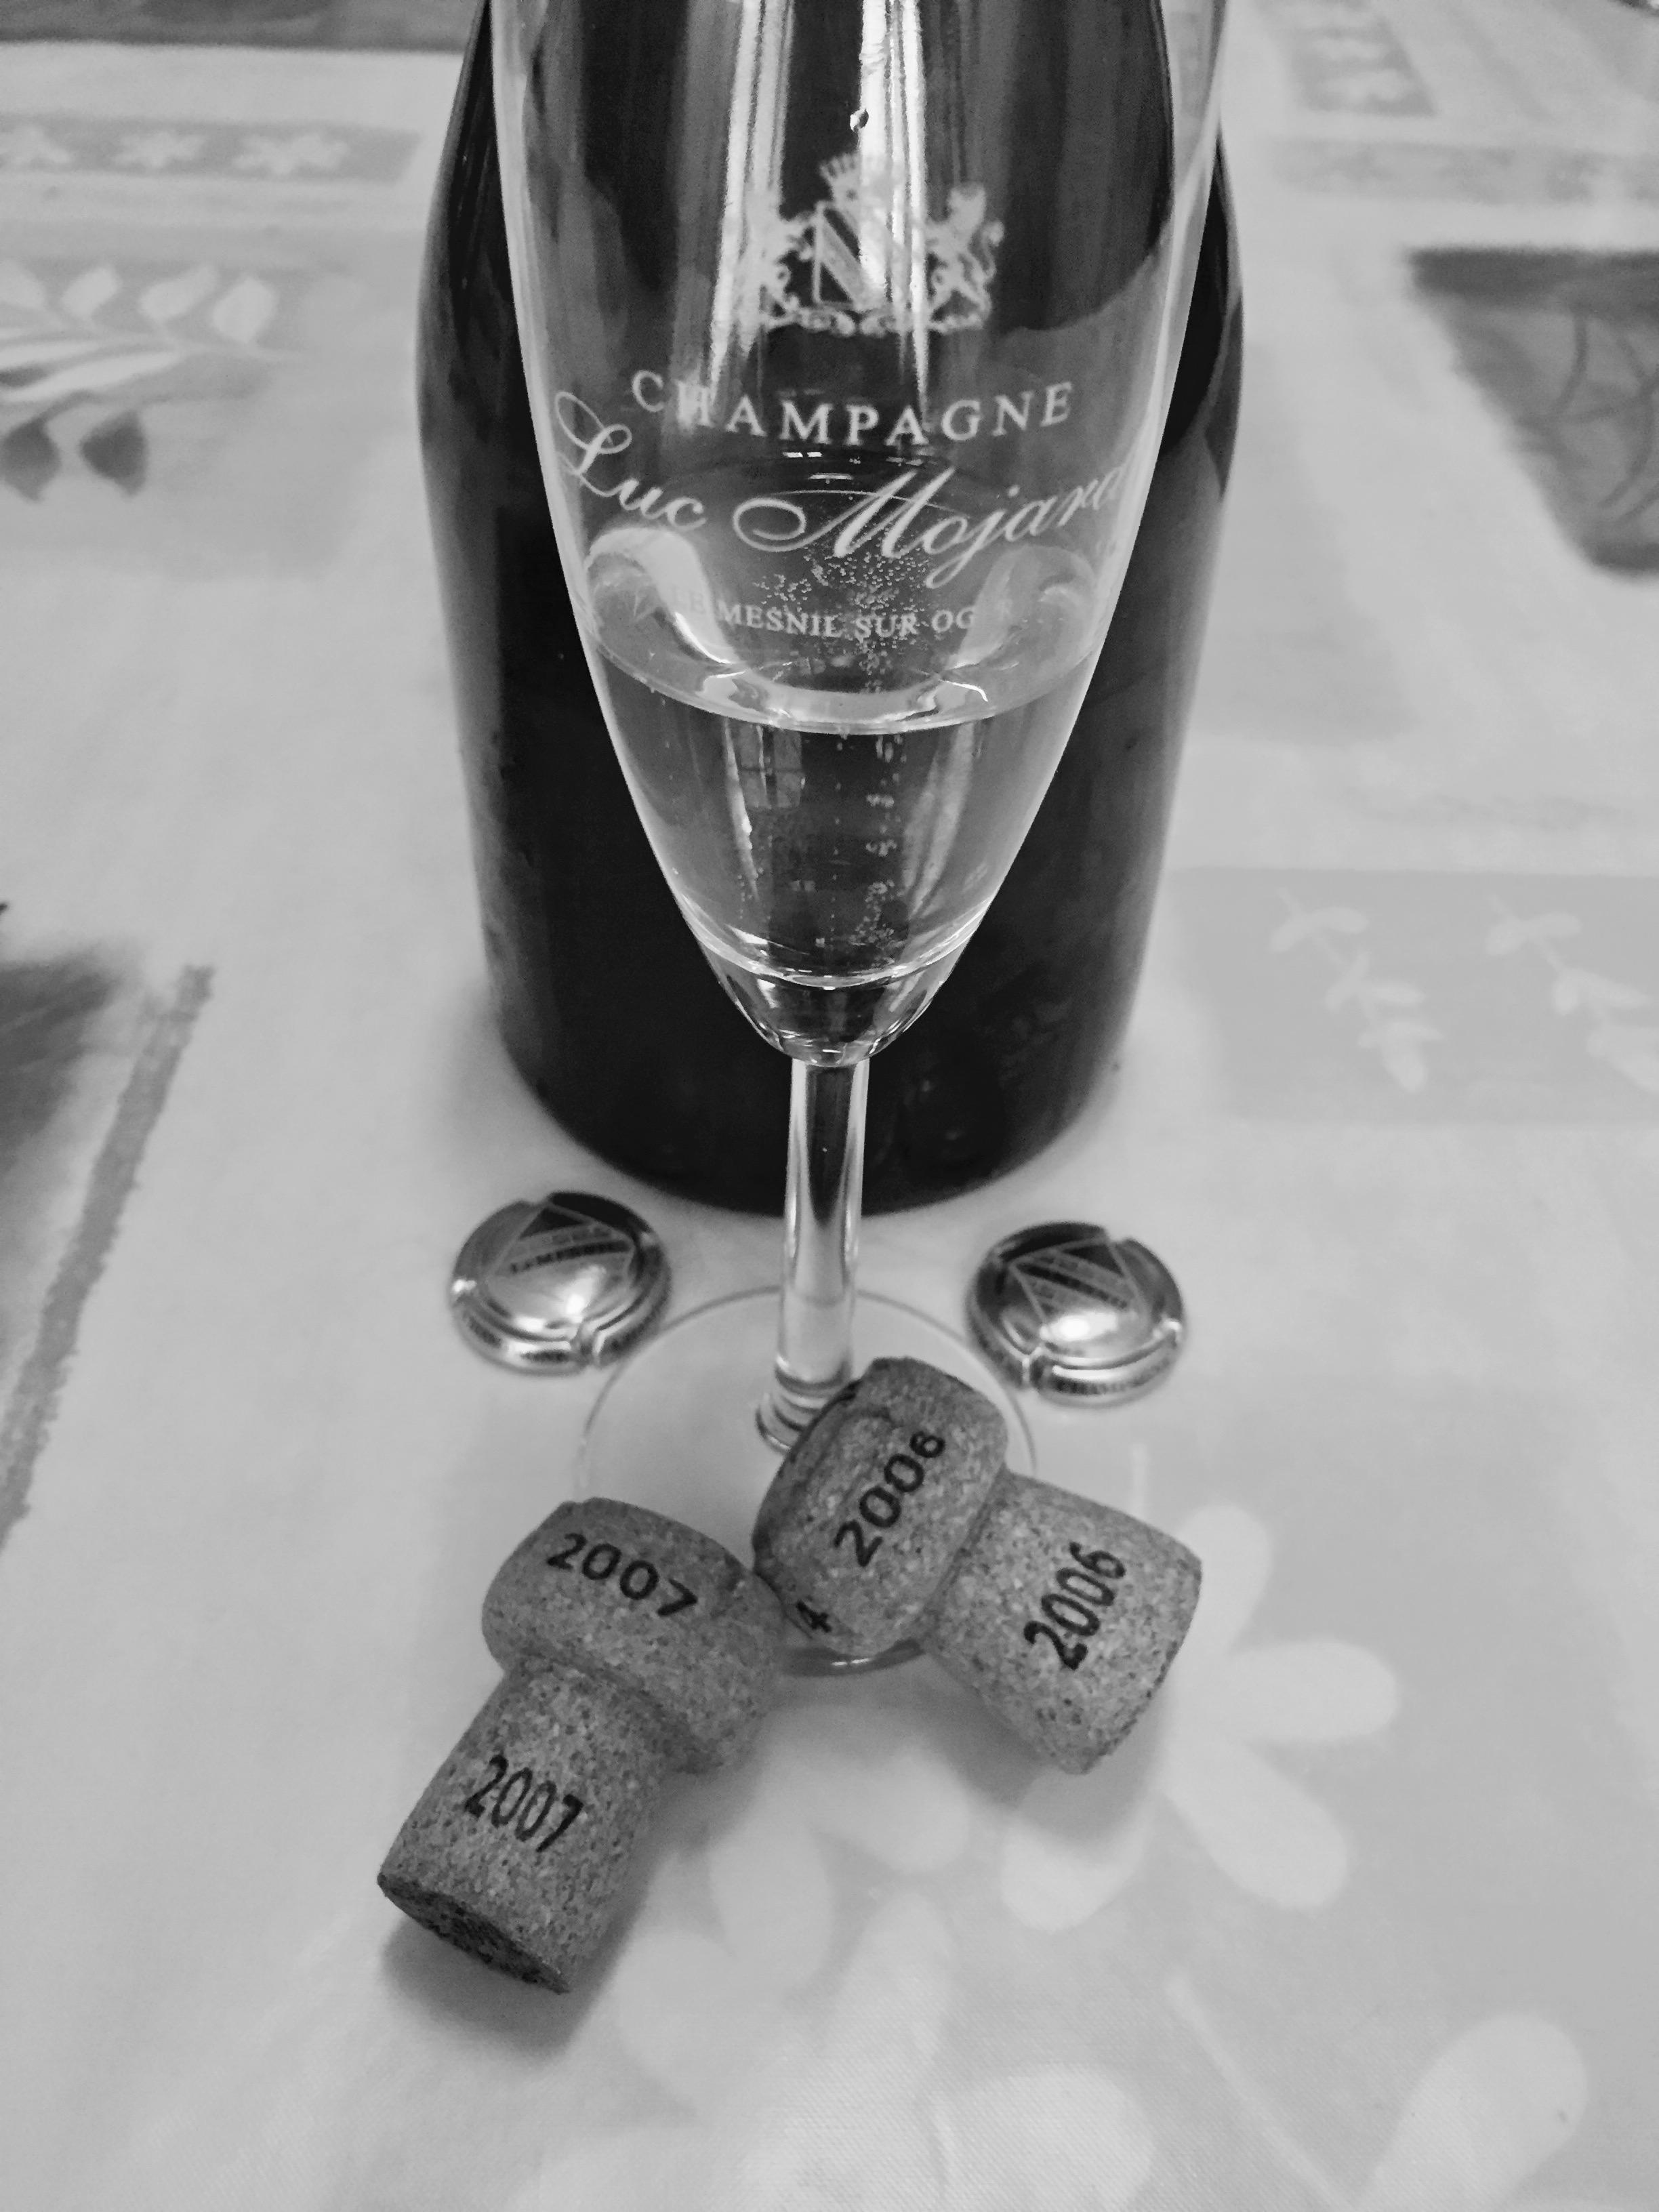 champagne luc mojard choisir verre